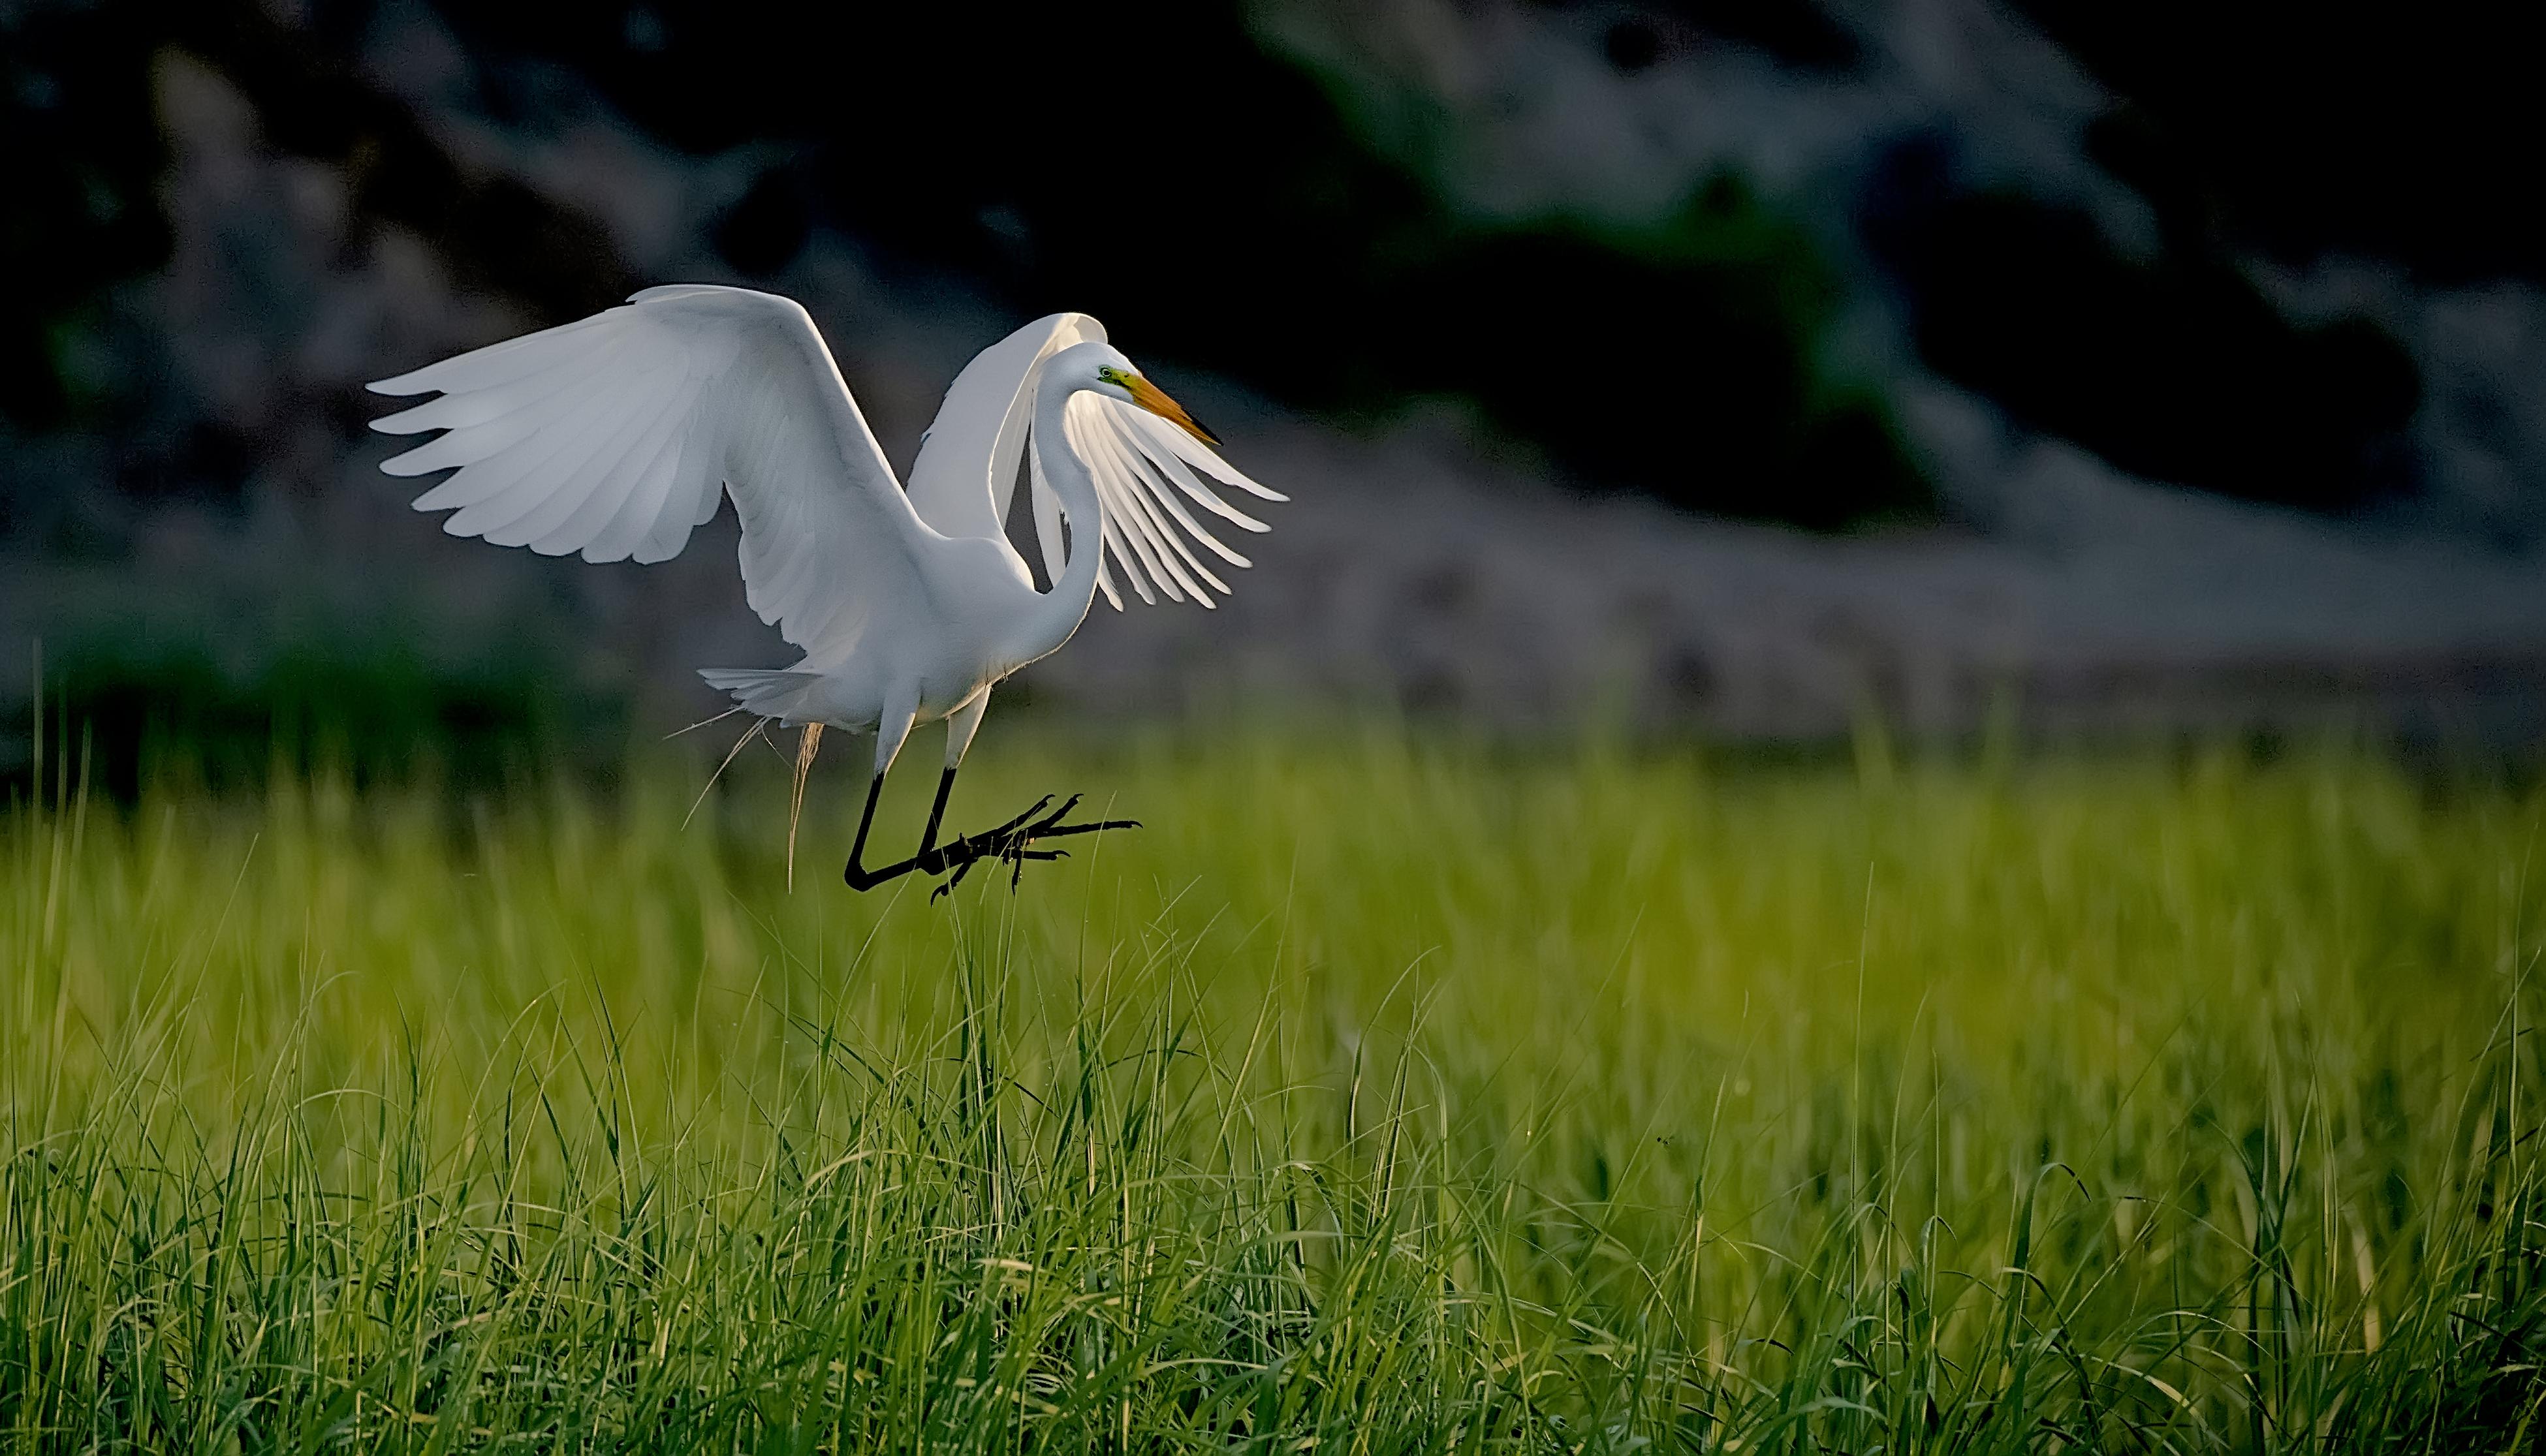 Egret-landing-in-Grass